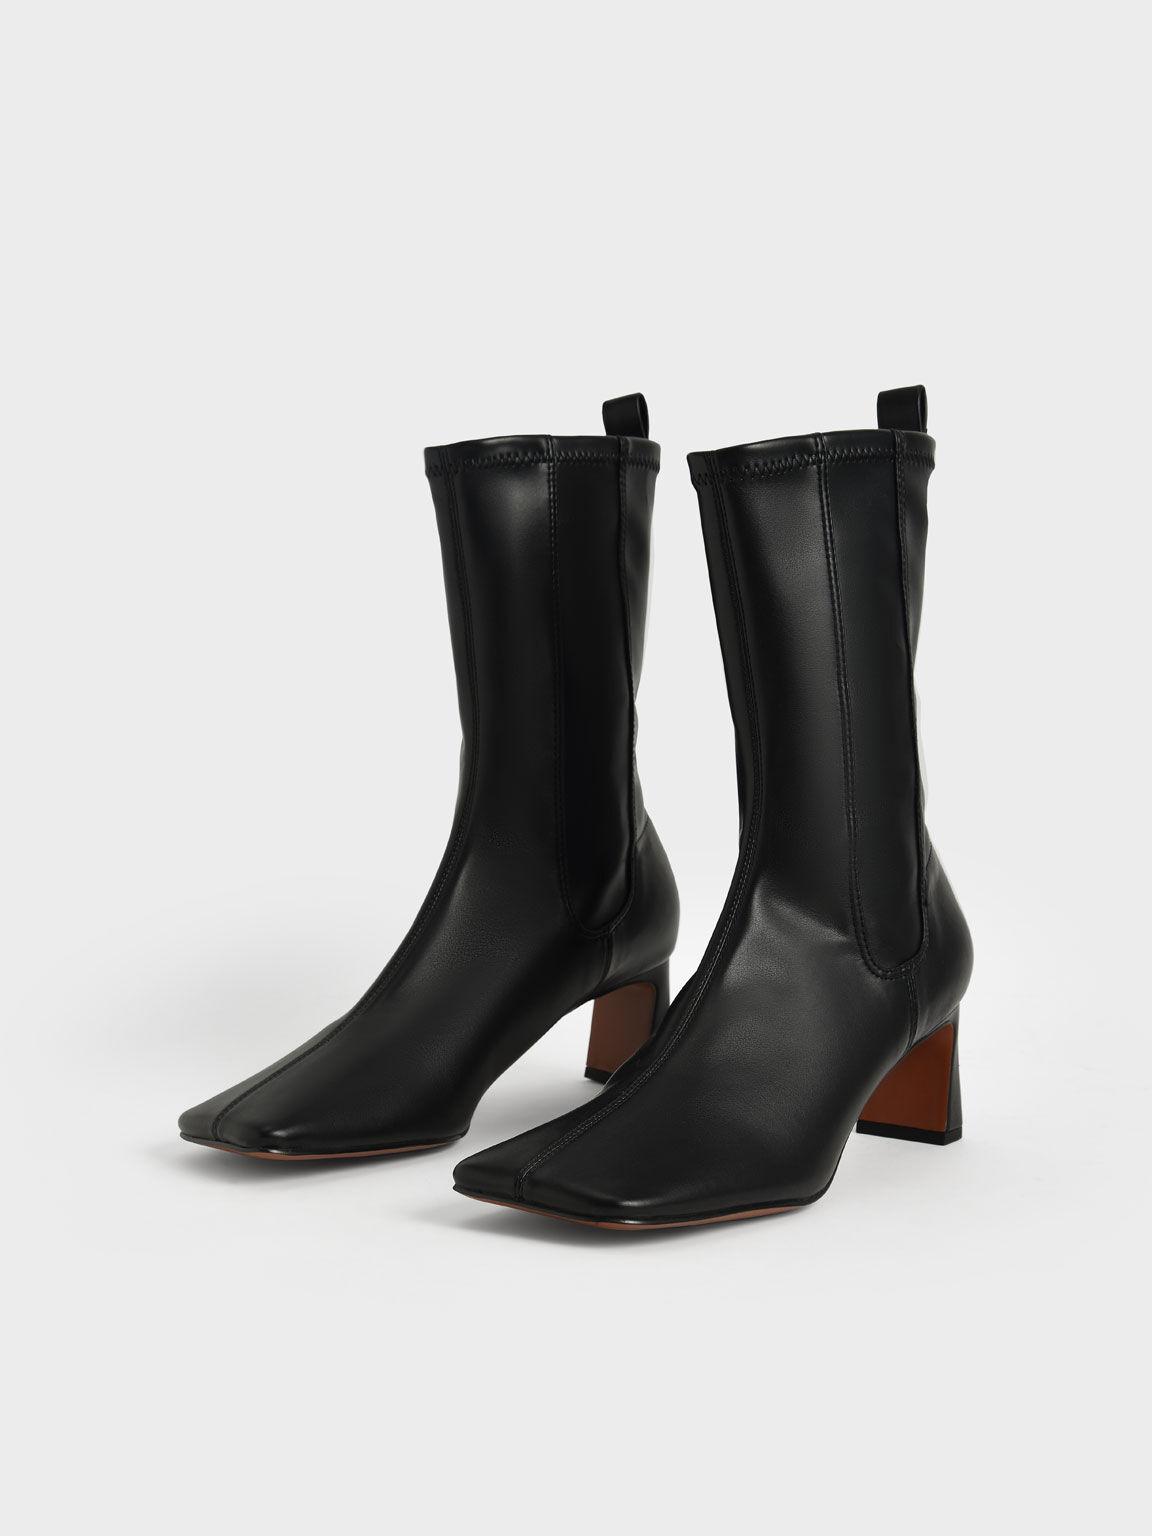 Stitch-Trim Slip-On Calf Boots, Black, hi-res